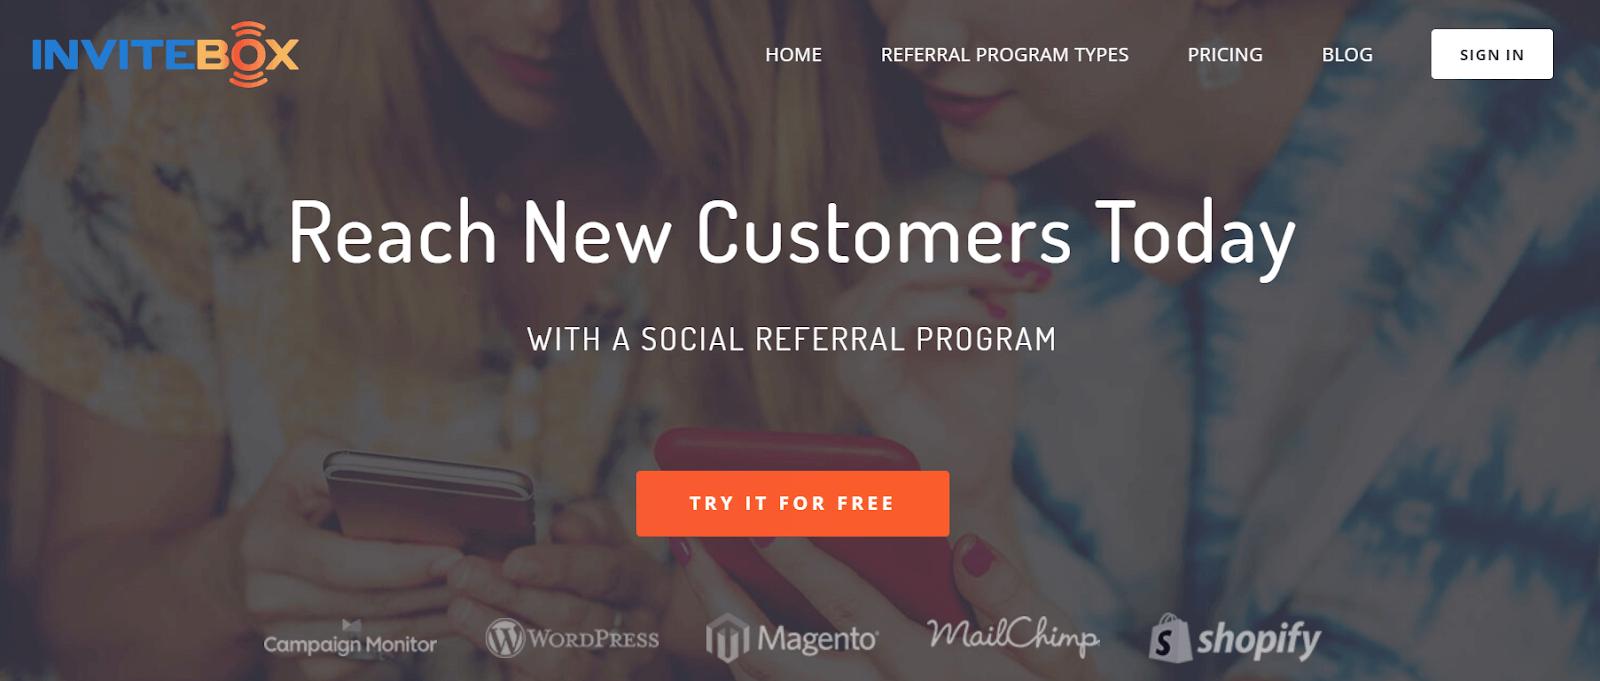 InviteBox Referral Marketing Software Tool